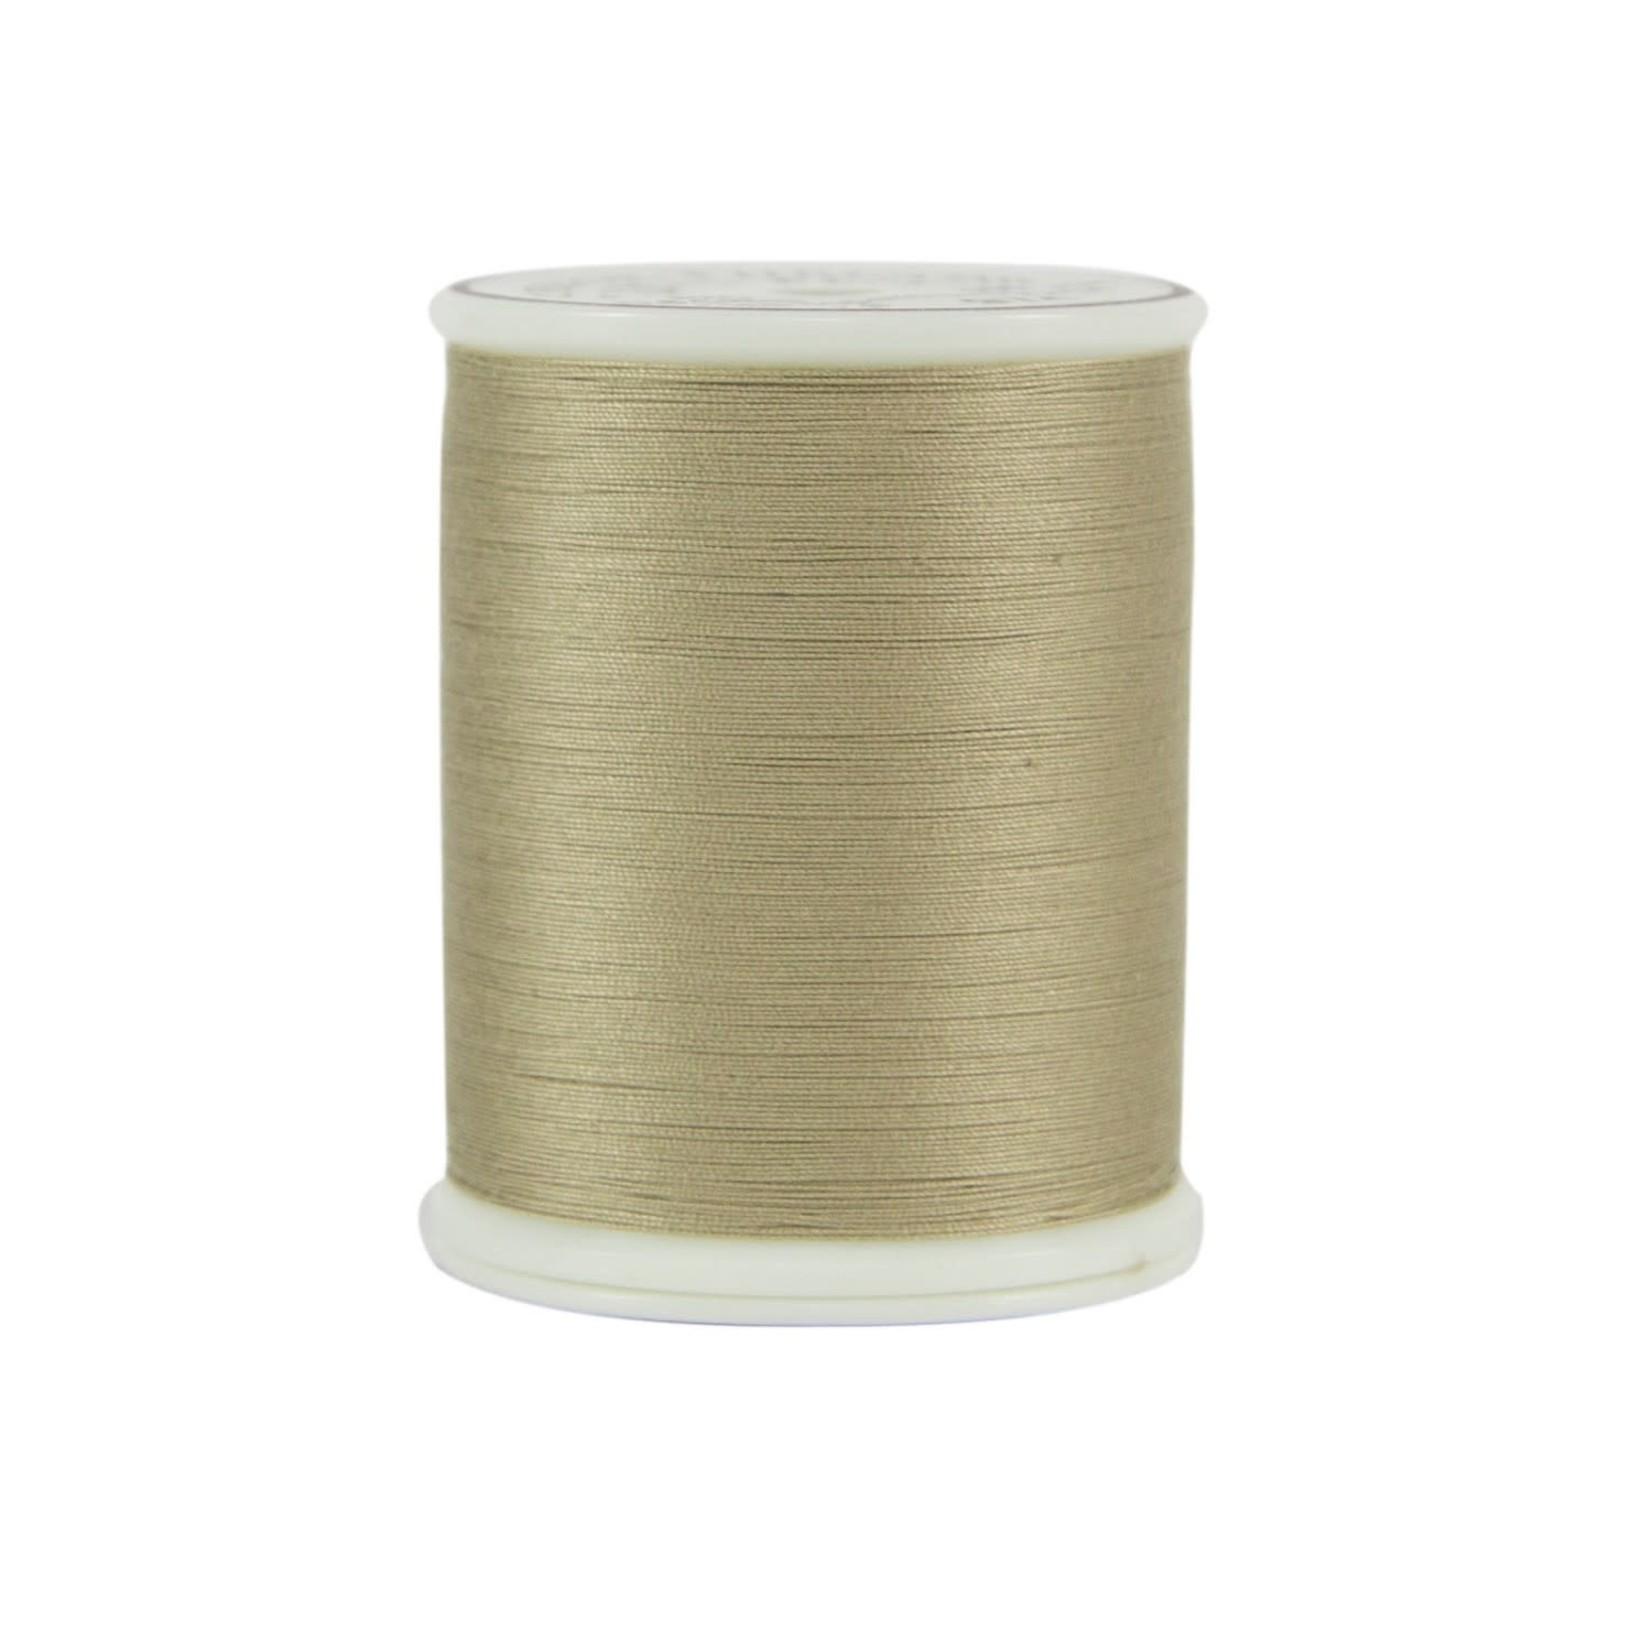 Superior Threads King Tut - #40 - 457 m - 0974 Bedouin